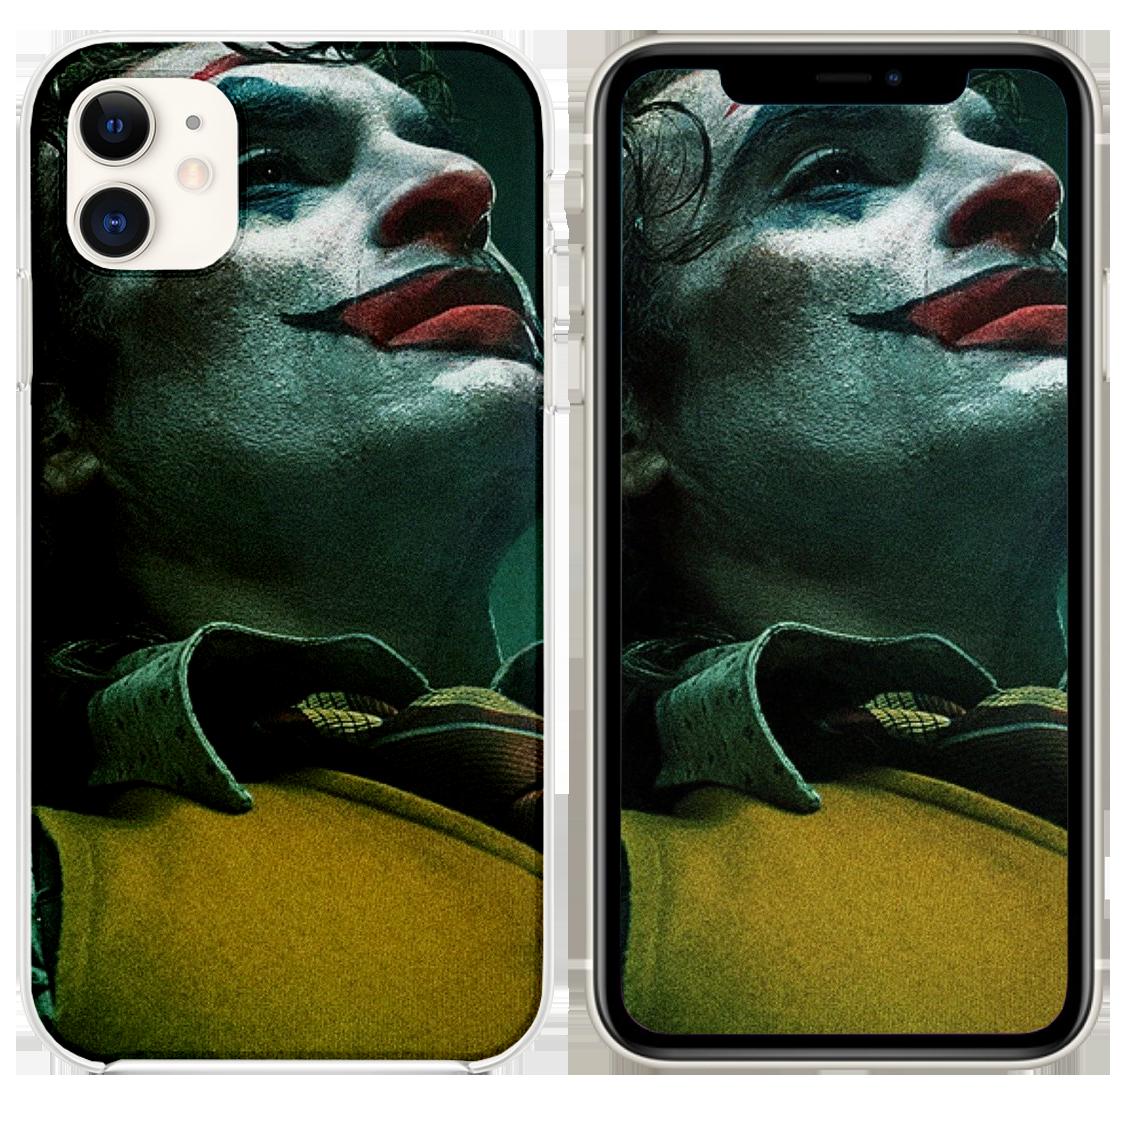 2019 Joker Joaquin Phoenix Iphone 11 Case Iphone 11 Case Joker